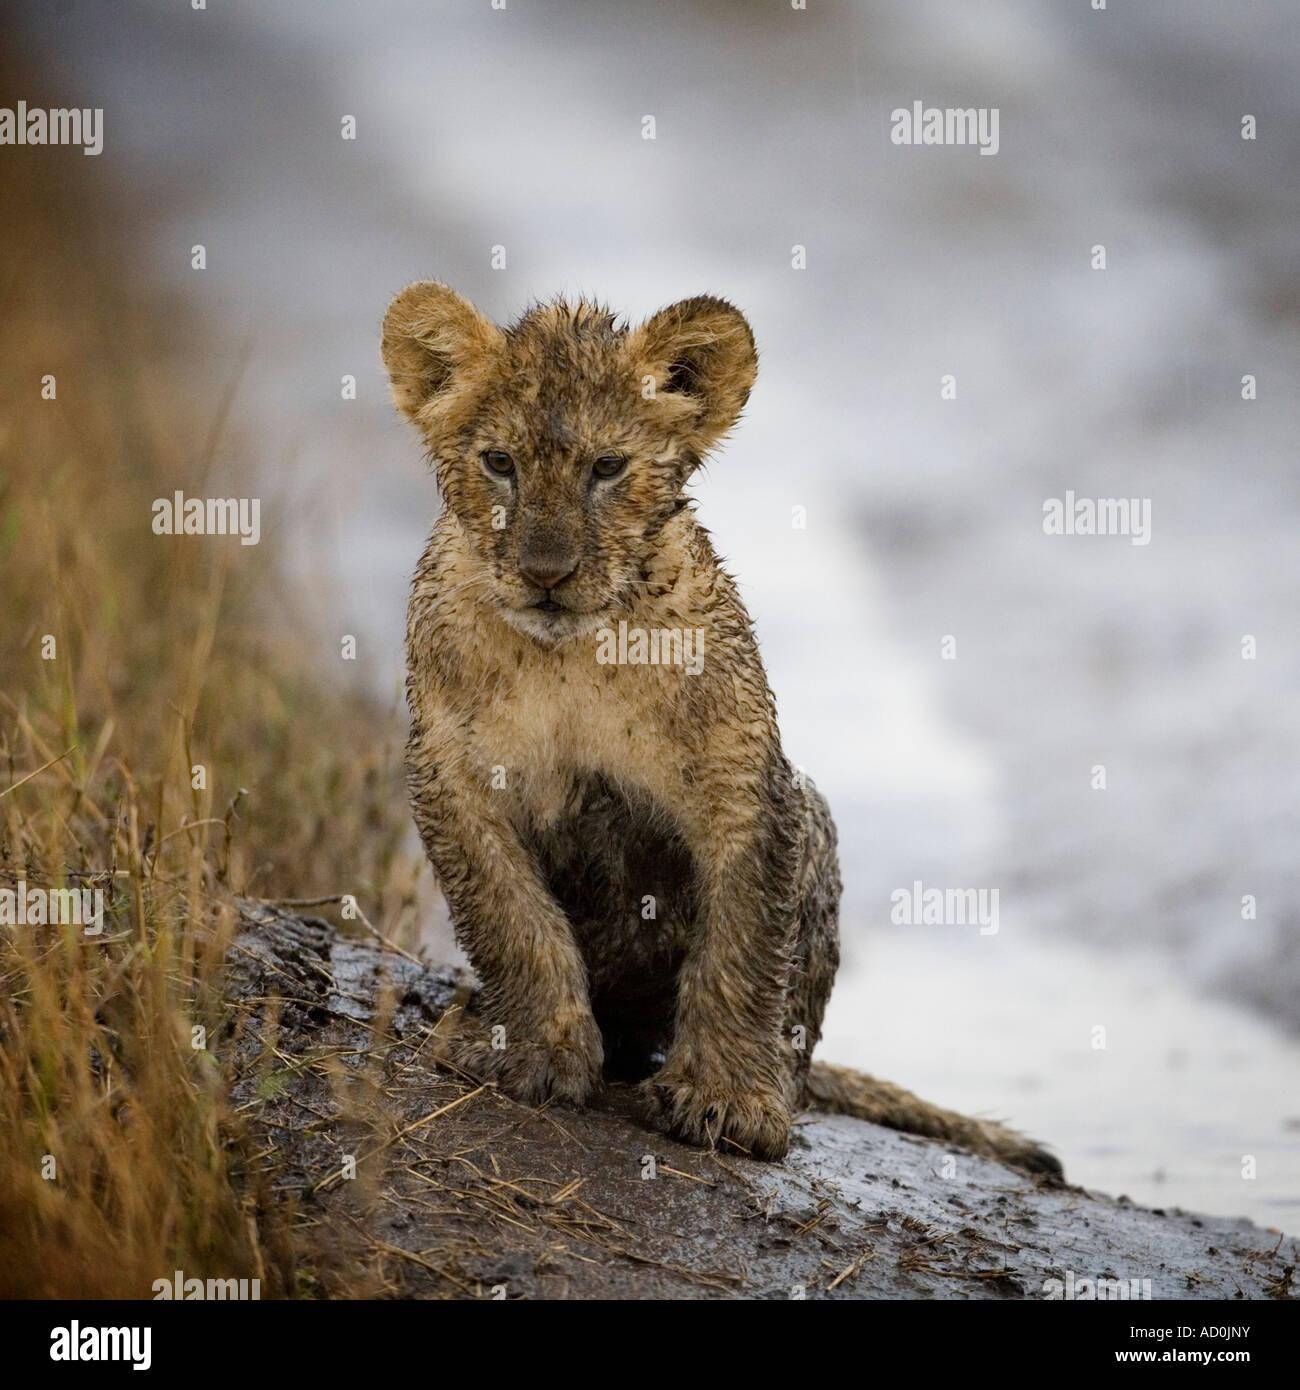 Africa Kenya Masai Mara Game Reserve Lion cub Panthera leo sitting covered in mud while playing in rain storm Stock Photo